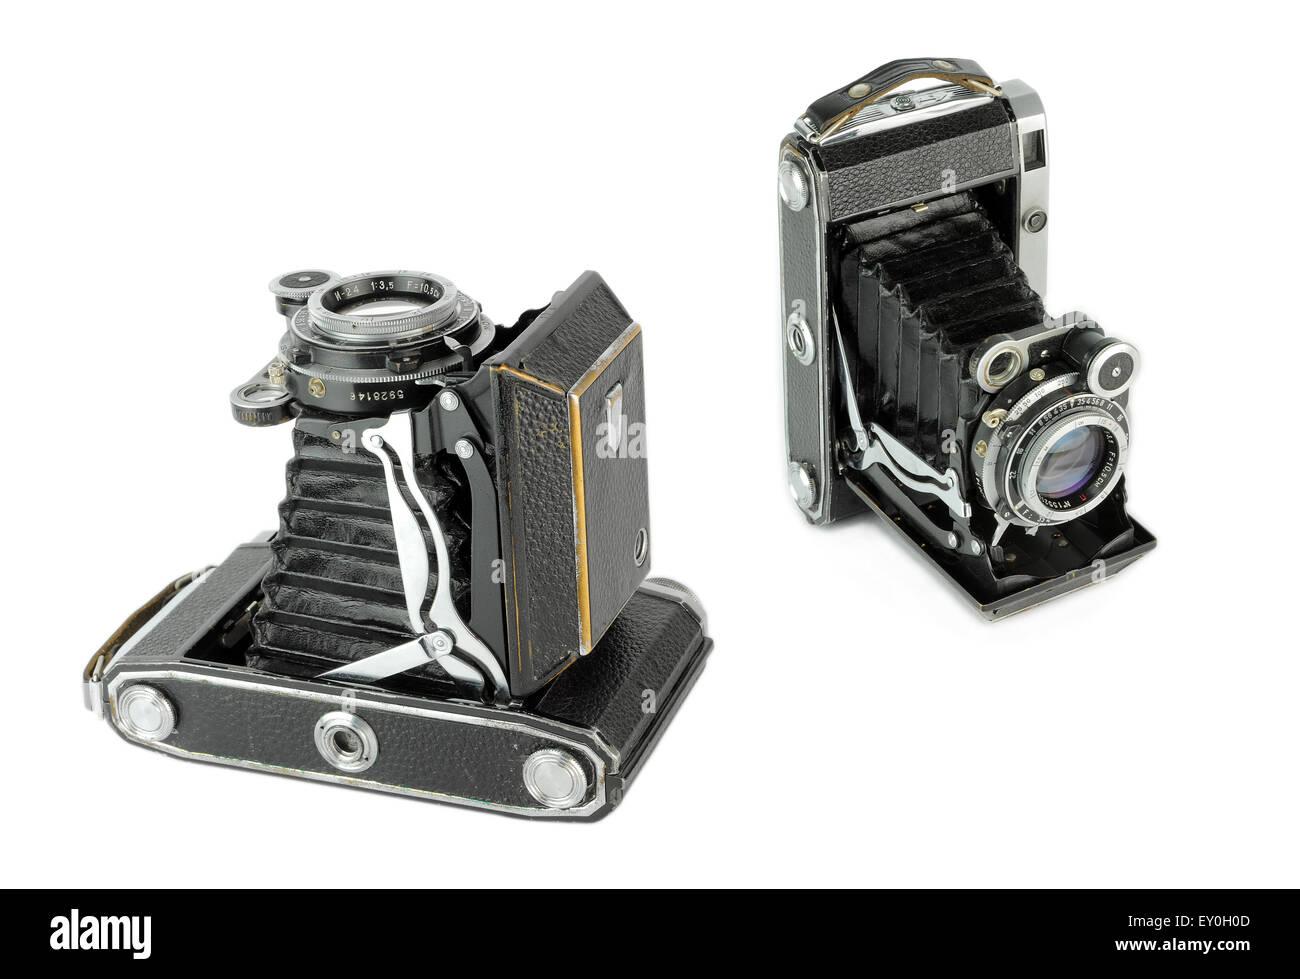 Very old Medium format portable vintage folding film camera - Stock Image